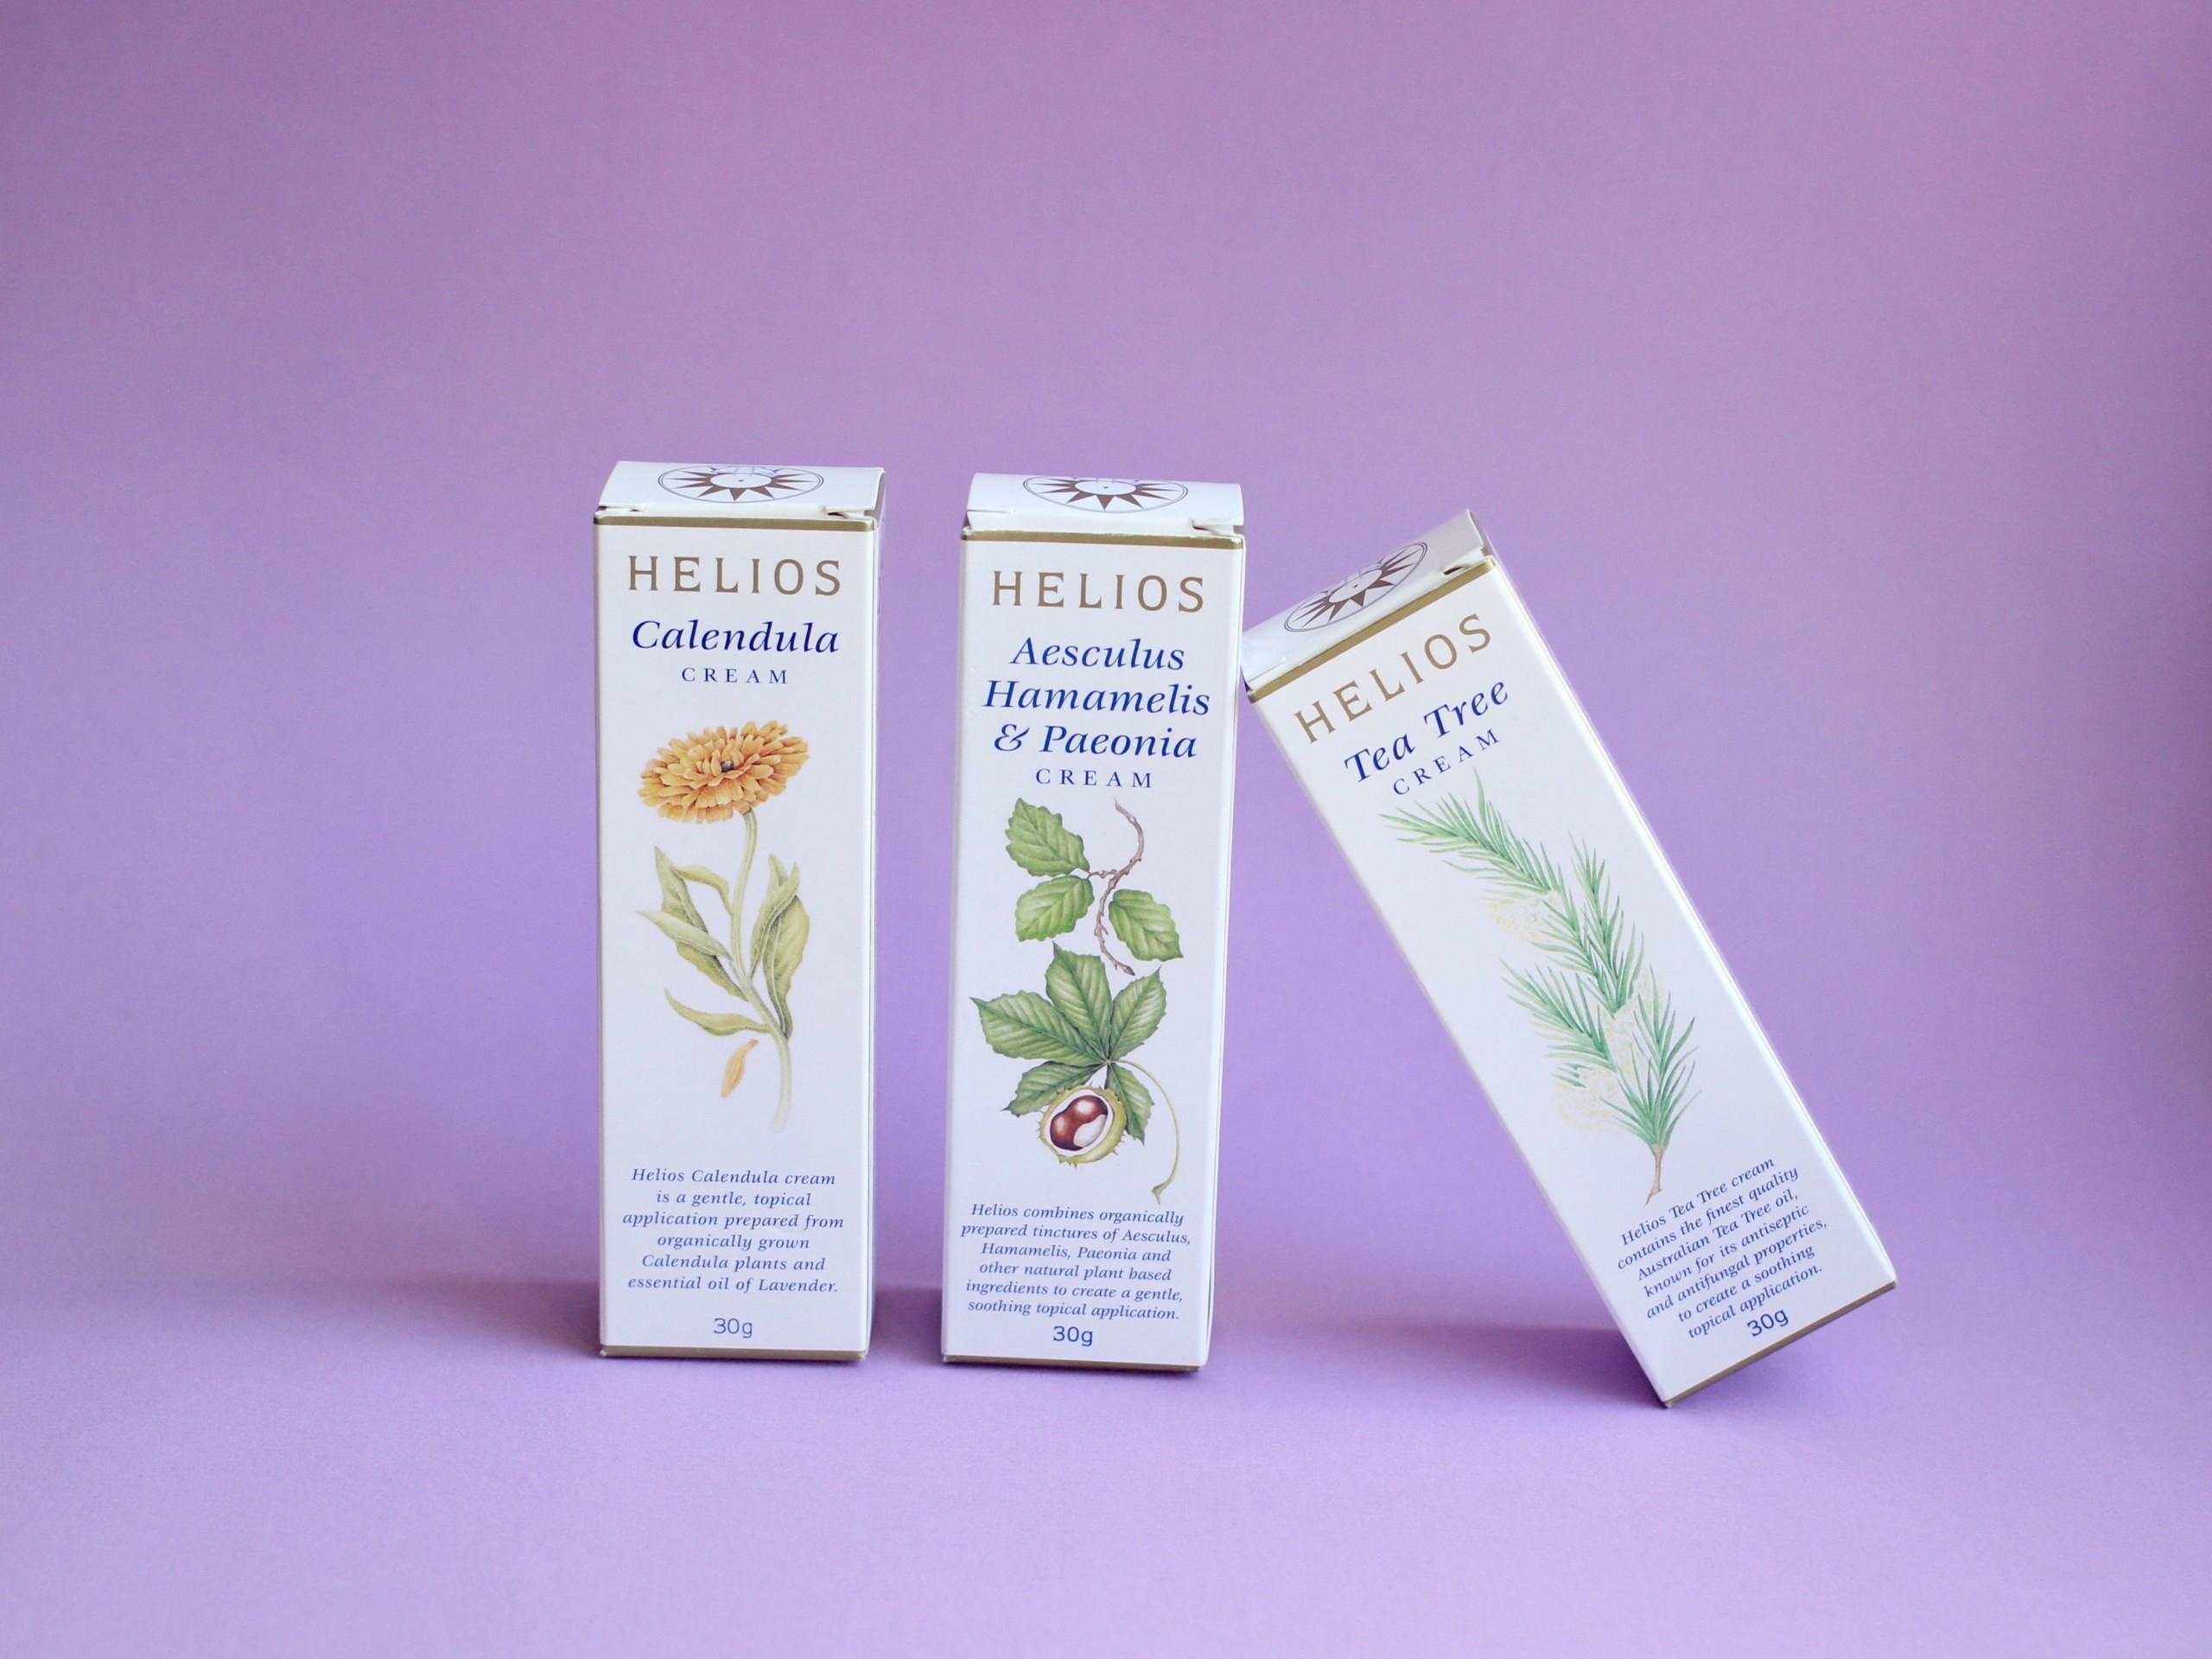 helios voiteet